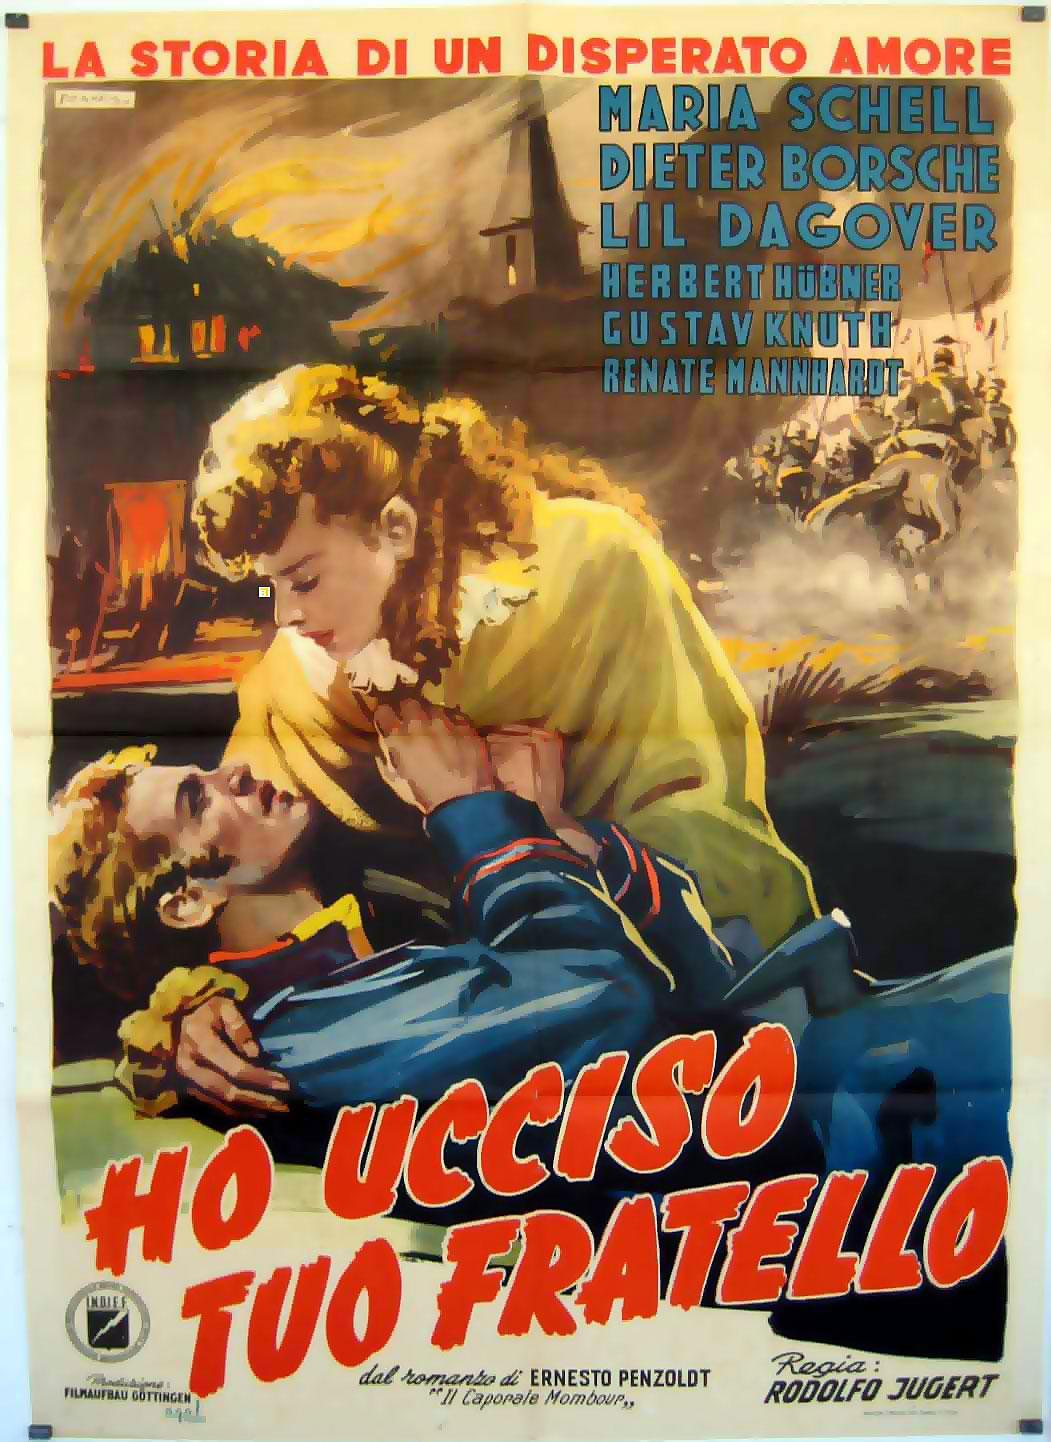 ES KOMMT EIN TAG MOVIE POSTER/HO UCCISO TUO FRATELLO/POSTER HO UCCISO TUO FRATELLO - 1950, Dir: RODOLFO JUGERT, Cast: MARIA SCHELL, DIETER BORSCHE, LIL DAGOVER, , , Nac. film: ALEMANIA, Company: , Designer: , ,